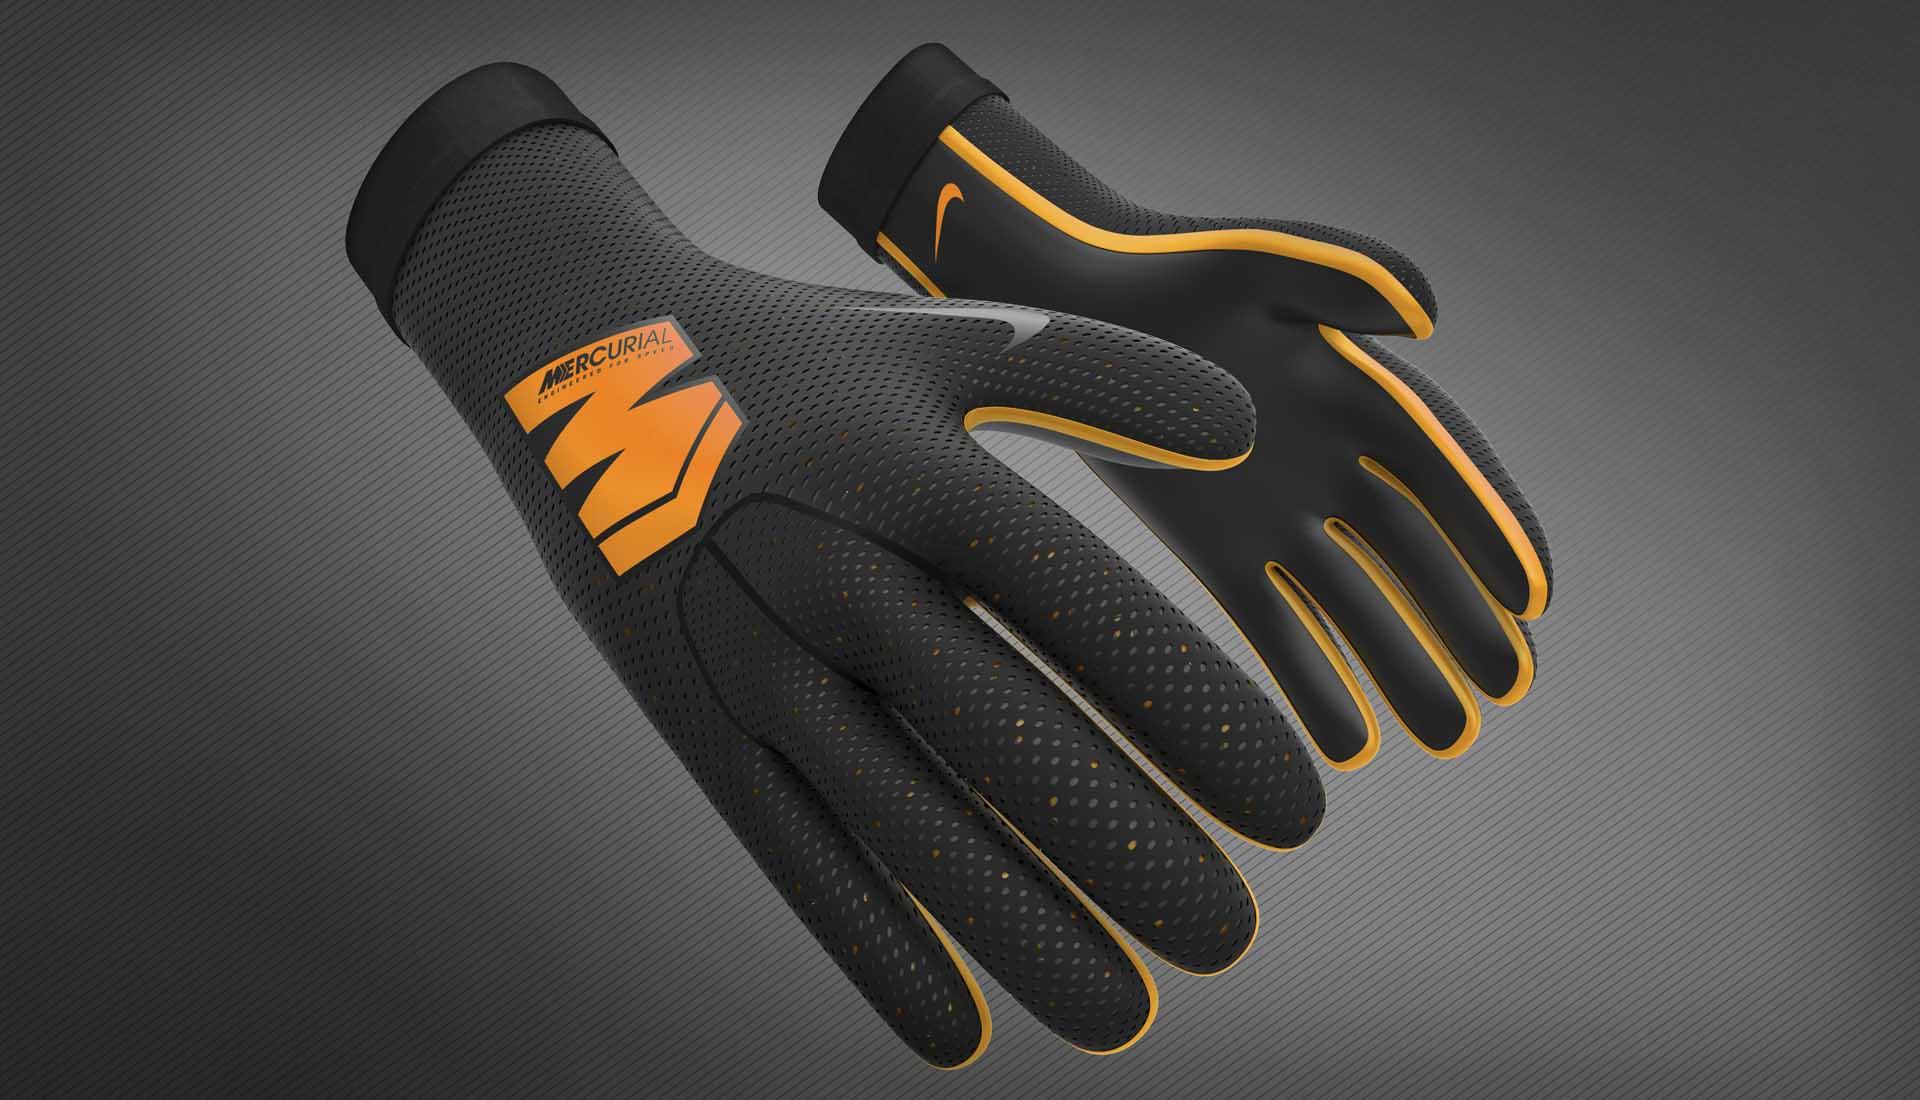 Nike Reimagines Goalkeeper Gloves With The Mercurial Touch Elite ... 9da823e146